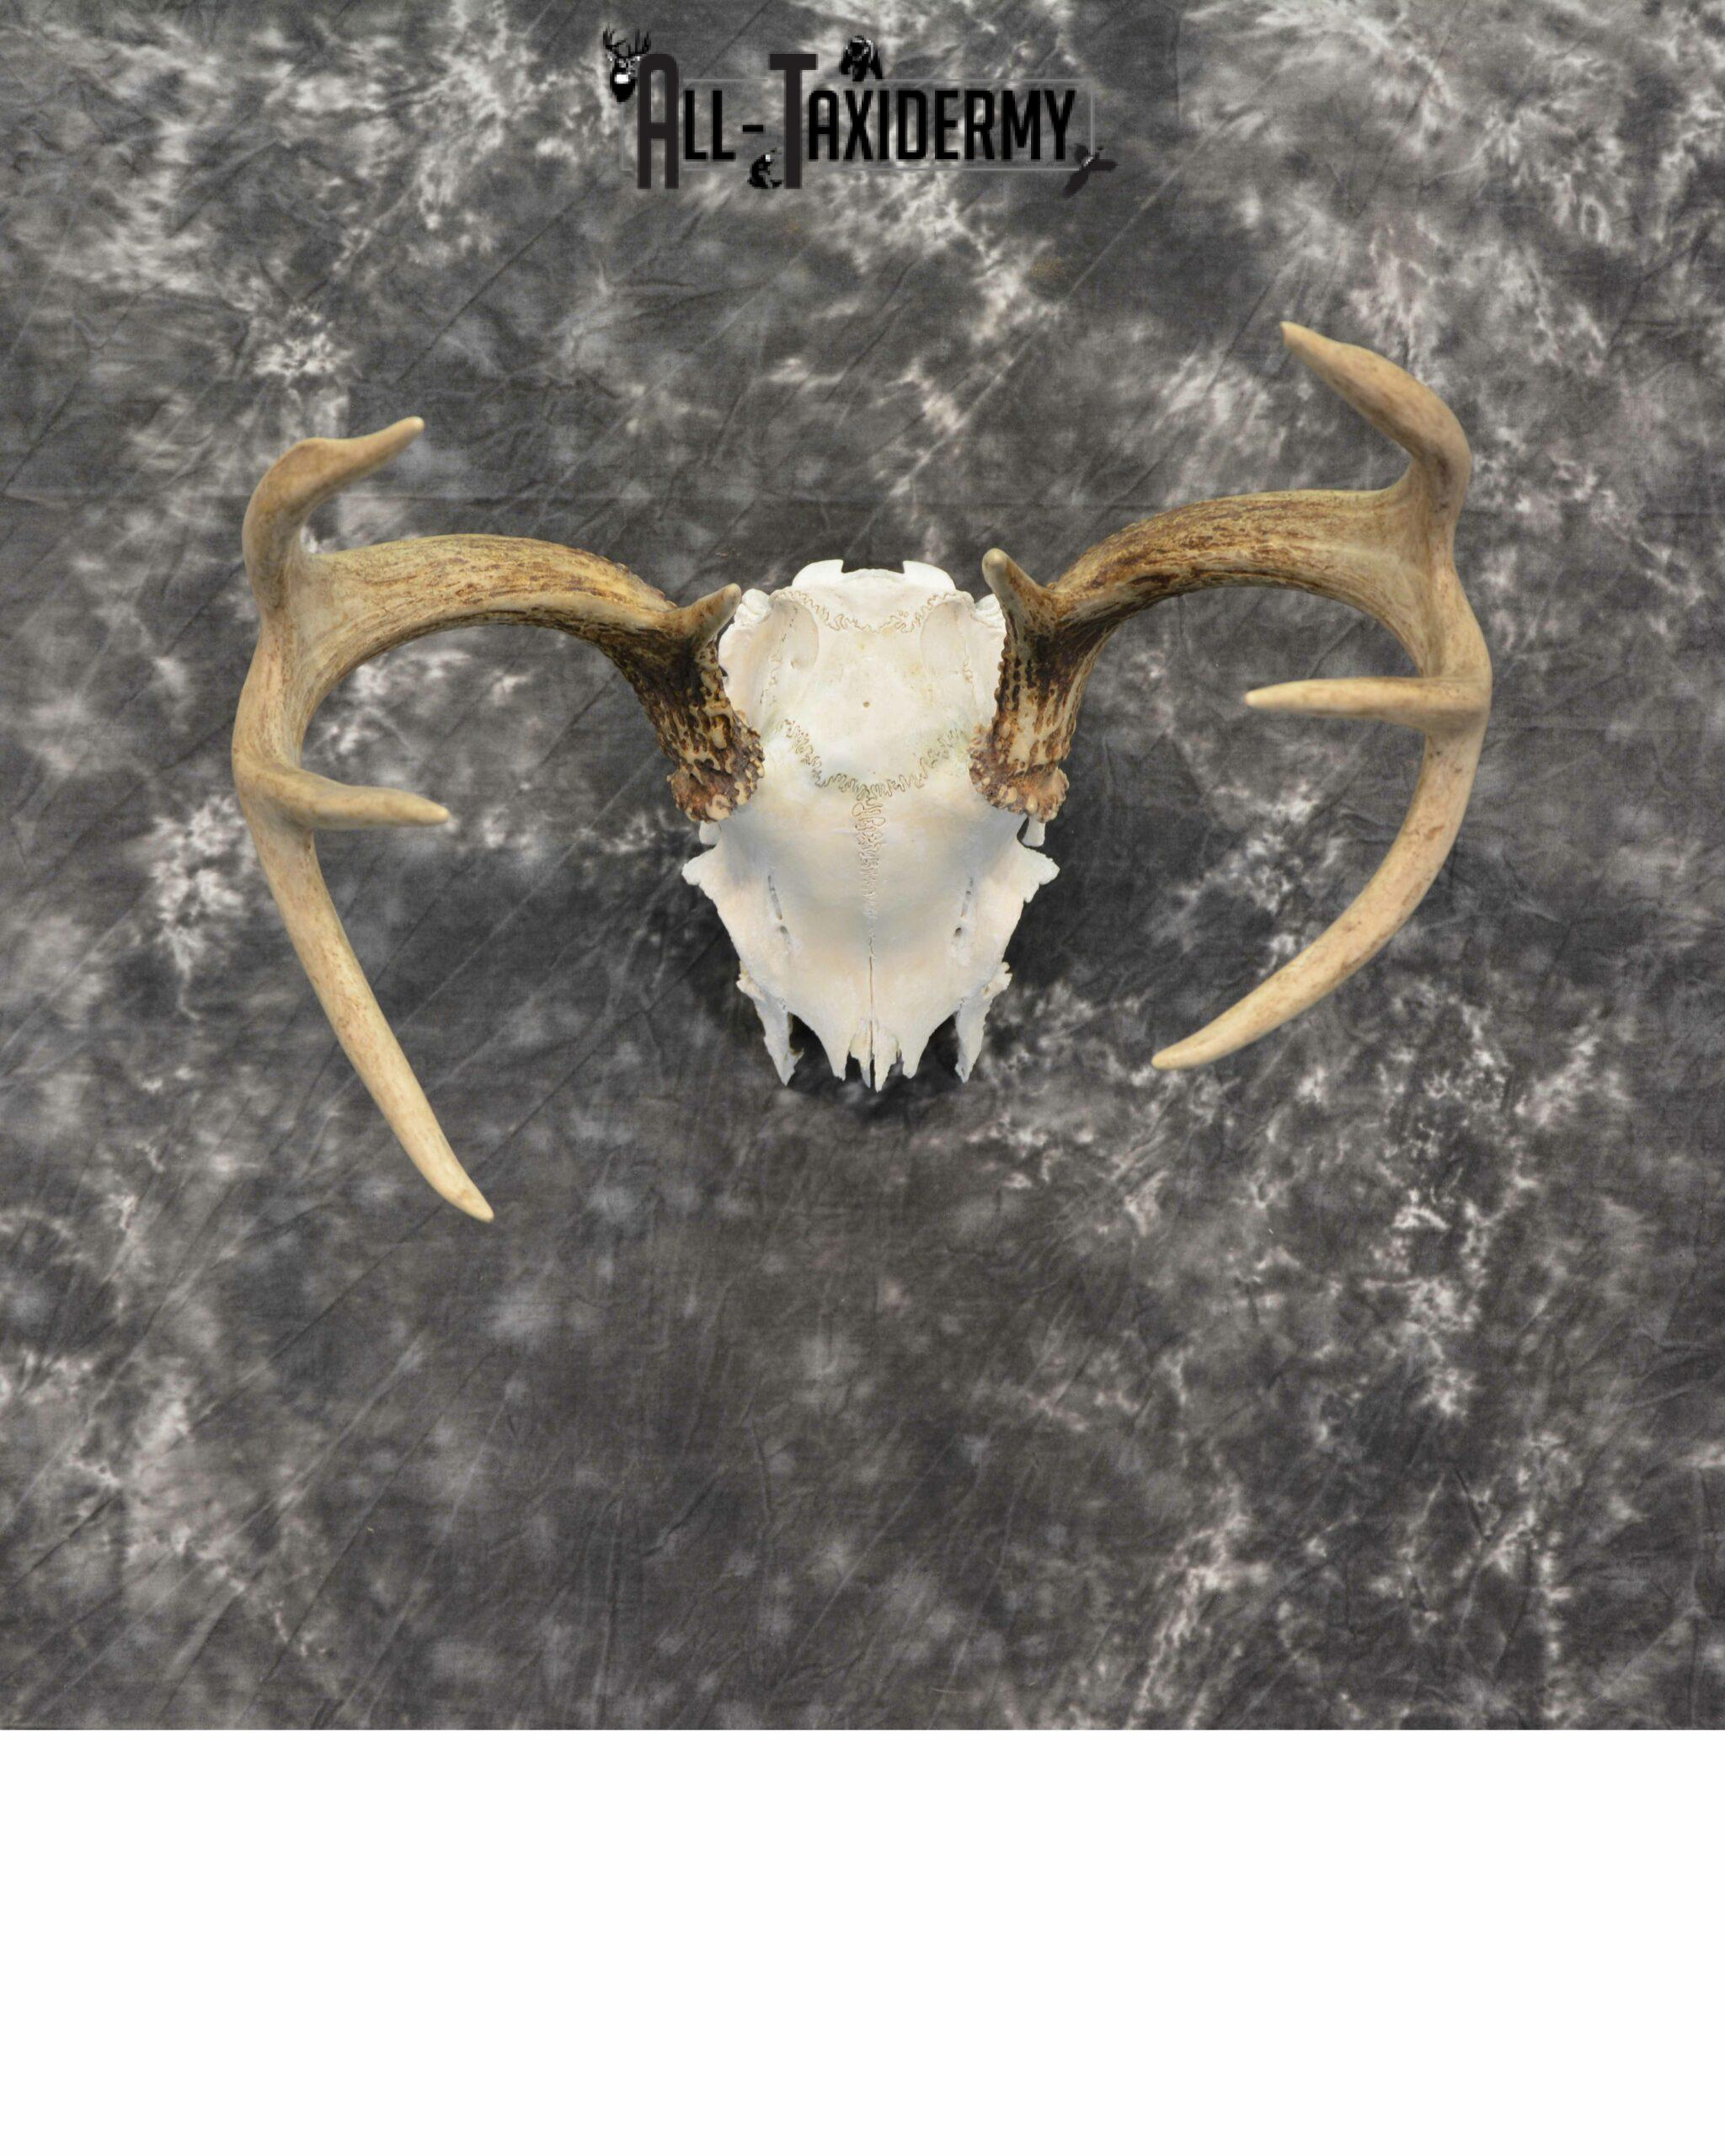 Whitetail Deer European Taxidermy mount for sale SKU 1037